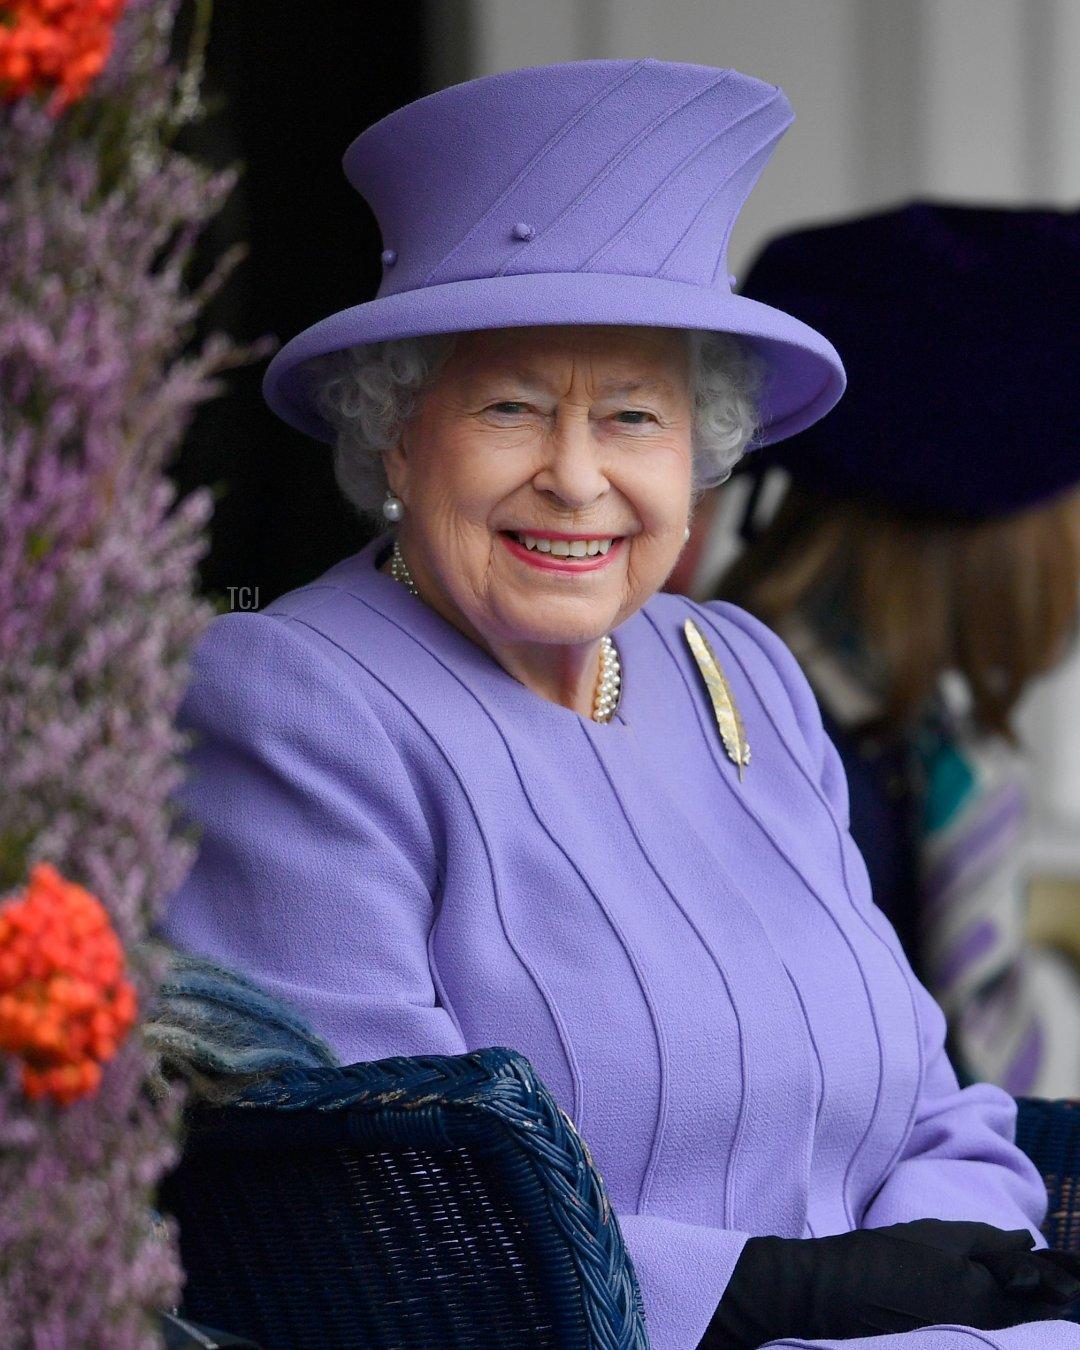 Queen Elizabeth II watches competitors at the Braemar Gathering on September 3, 2016 in Braemar, Scotland